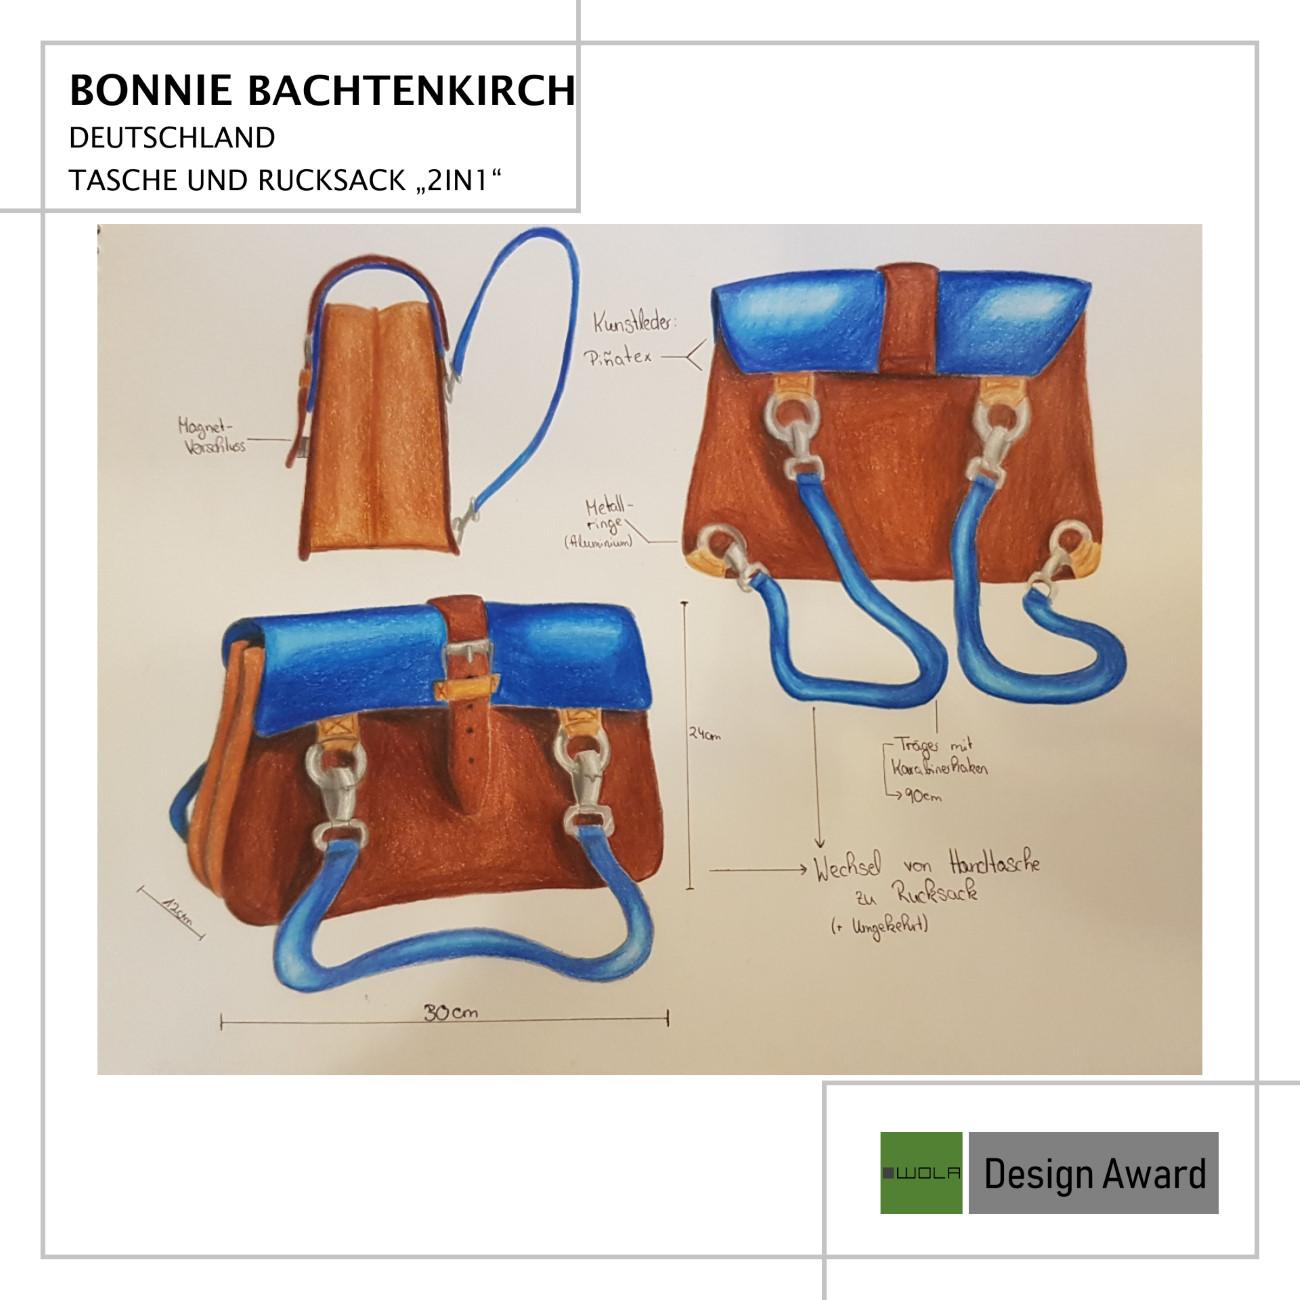 Beitrag WOLA Design Award - Bonnie Bachtenkirch 1